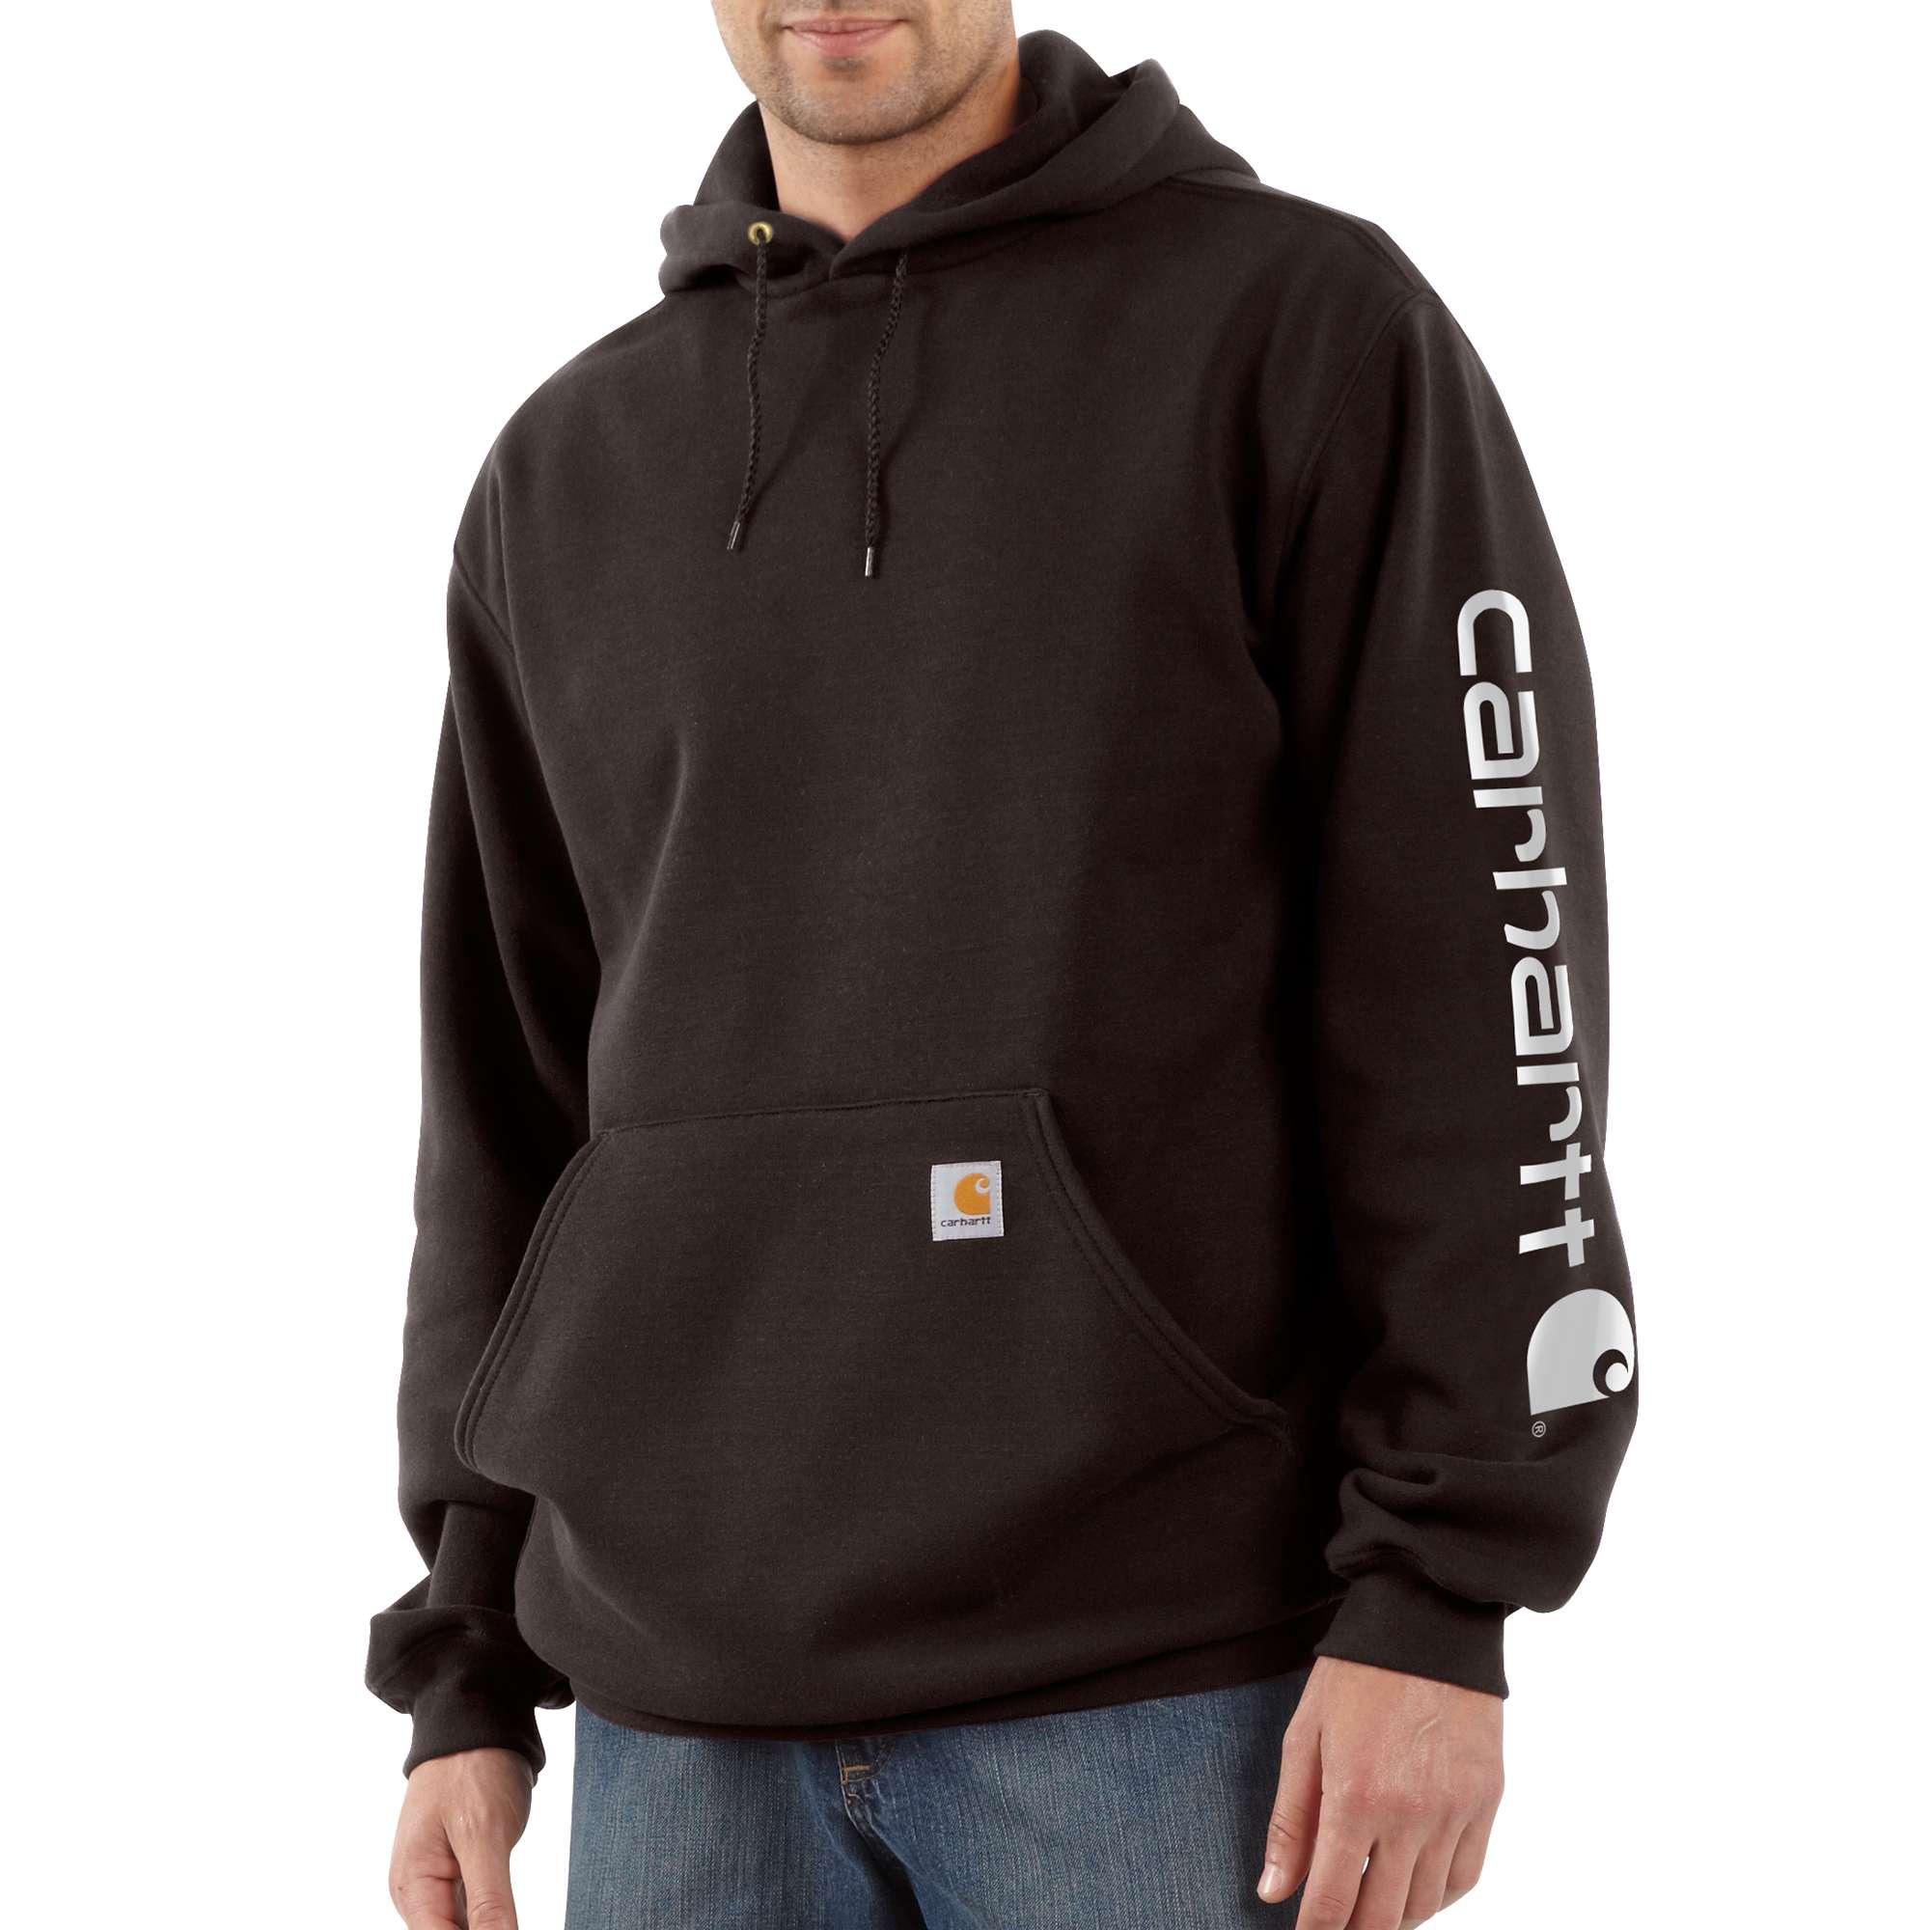 Men's Midweight Signature Logo Sleeve Hooded Sweat, Dark Brown,Dark Natural, swatch